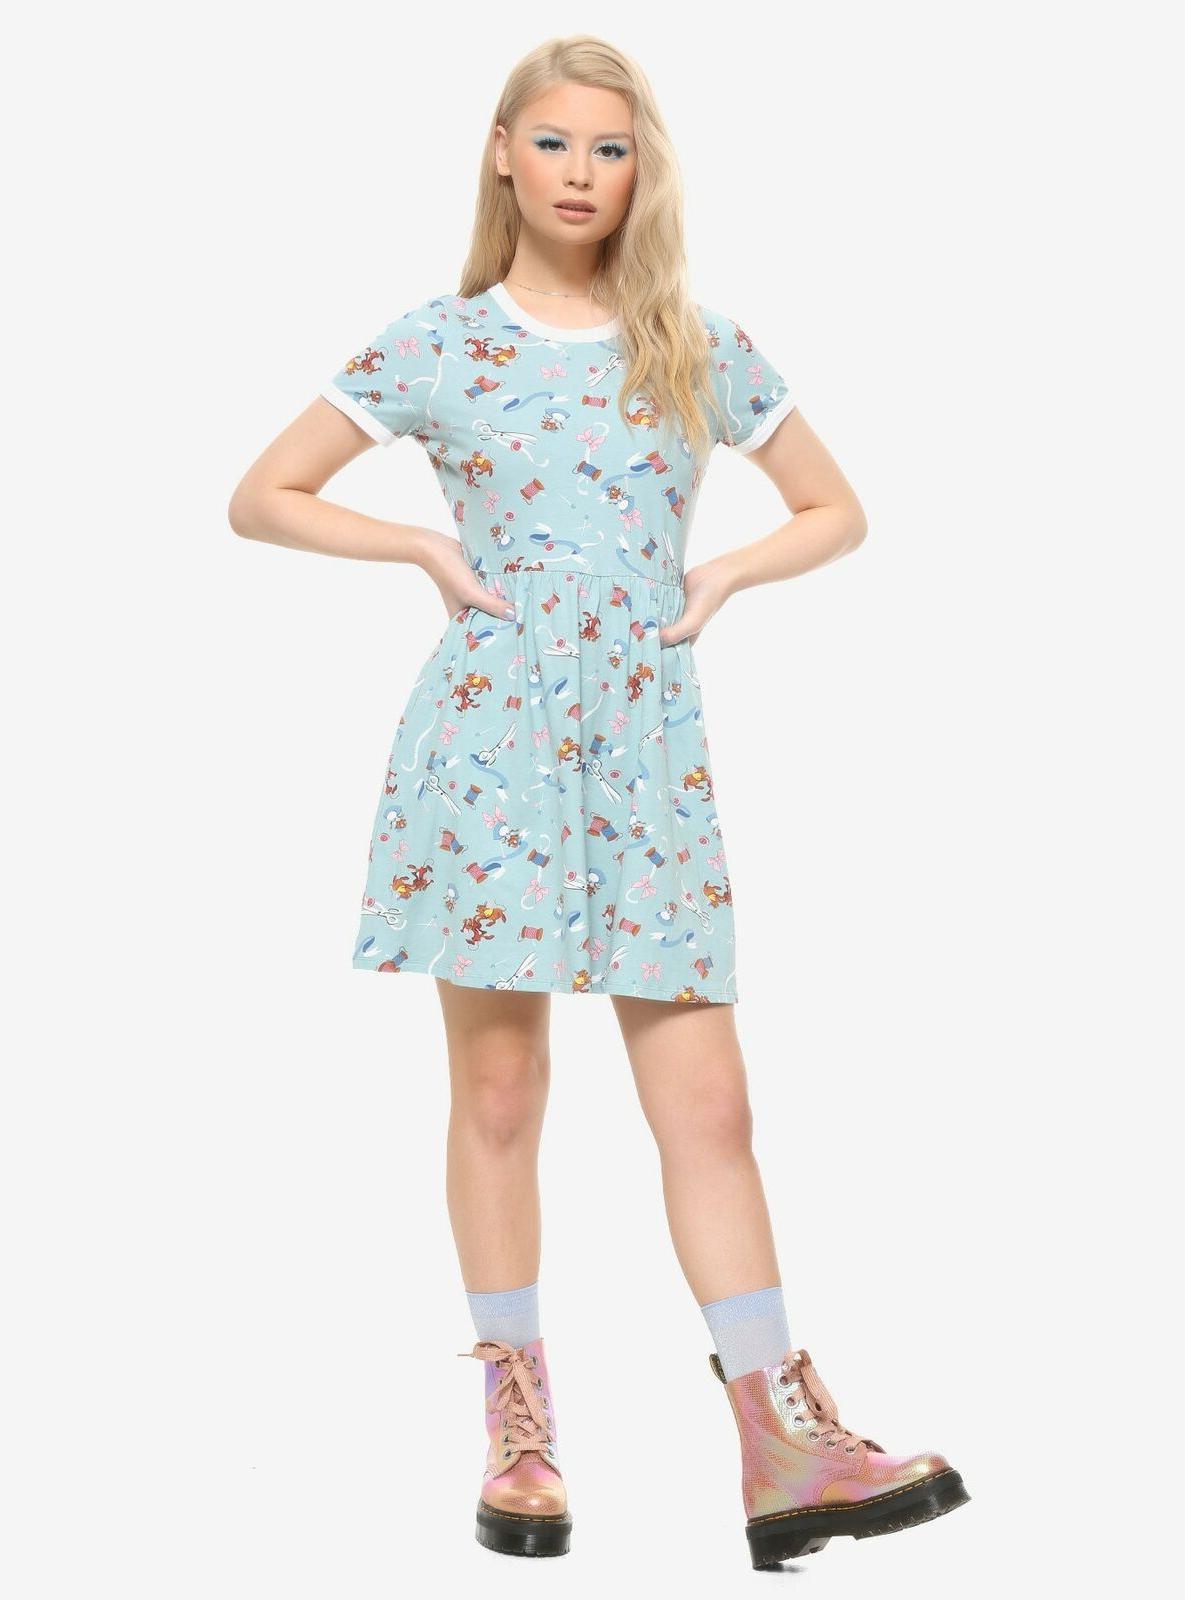 DISNEY DRESS HER MICE SEWING GUS TAPE 70